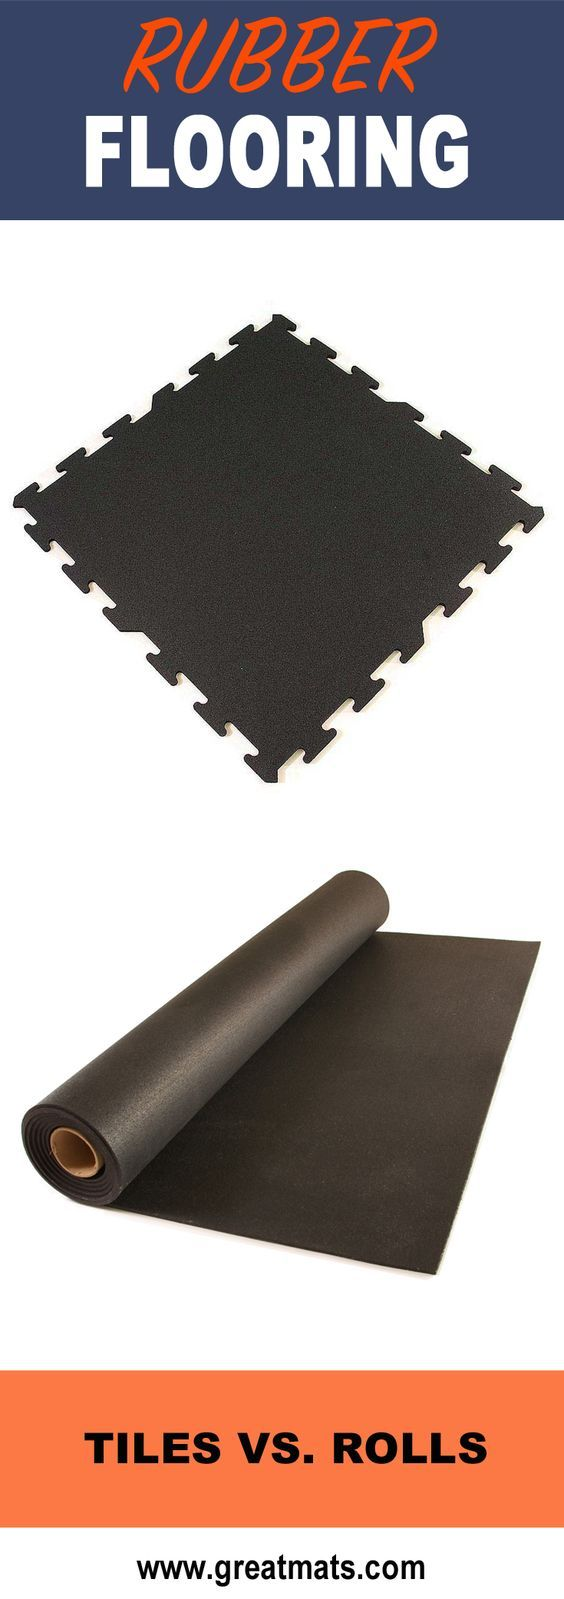 Rubber floor mats denver - Rubber Flooring Rolls Vs Rubber Floor Tiles